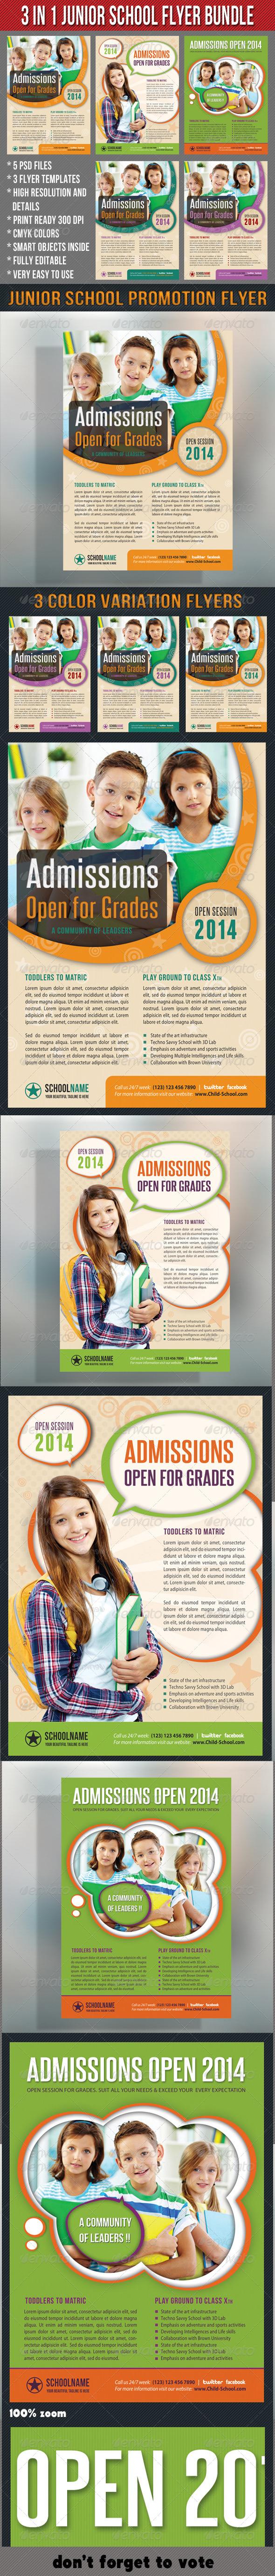 3 in 1 Junior School Promotion Flyer Bundle 01 - Events Flyers